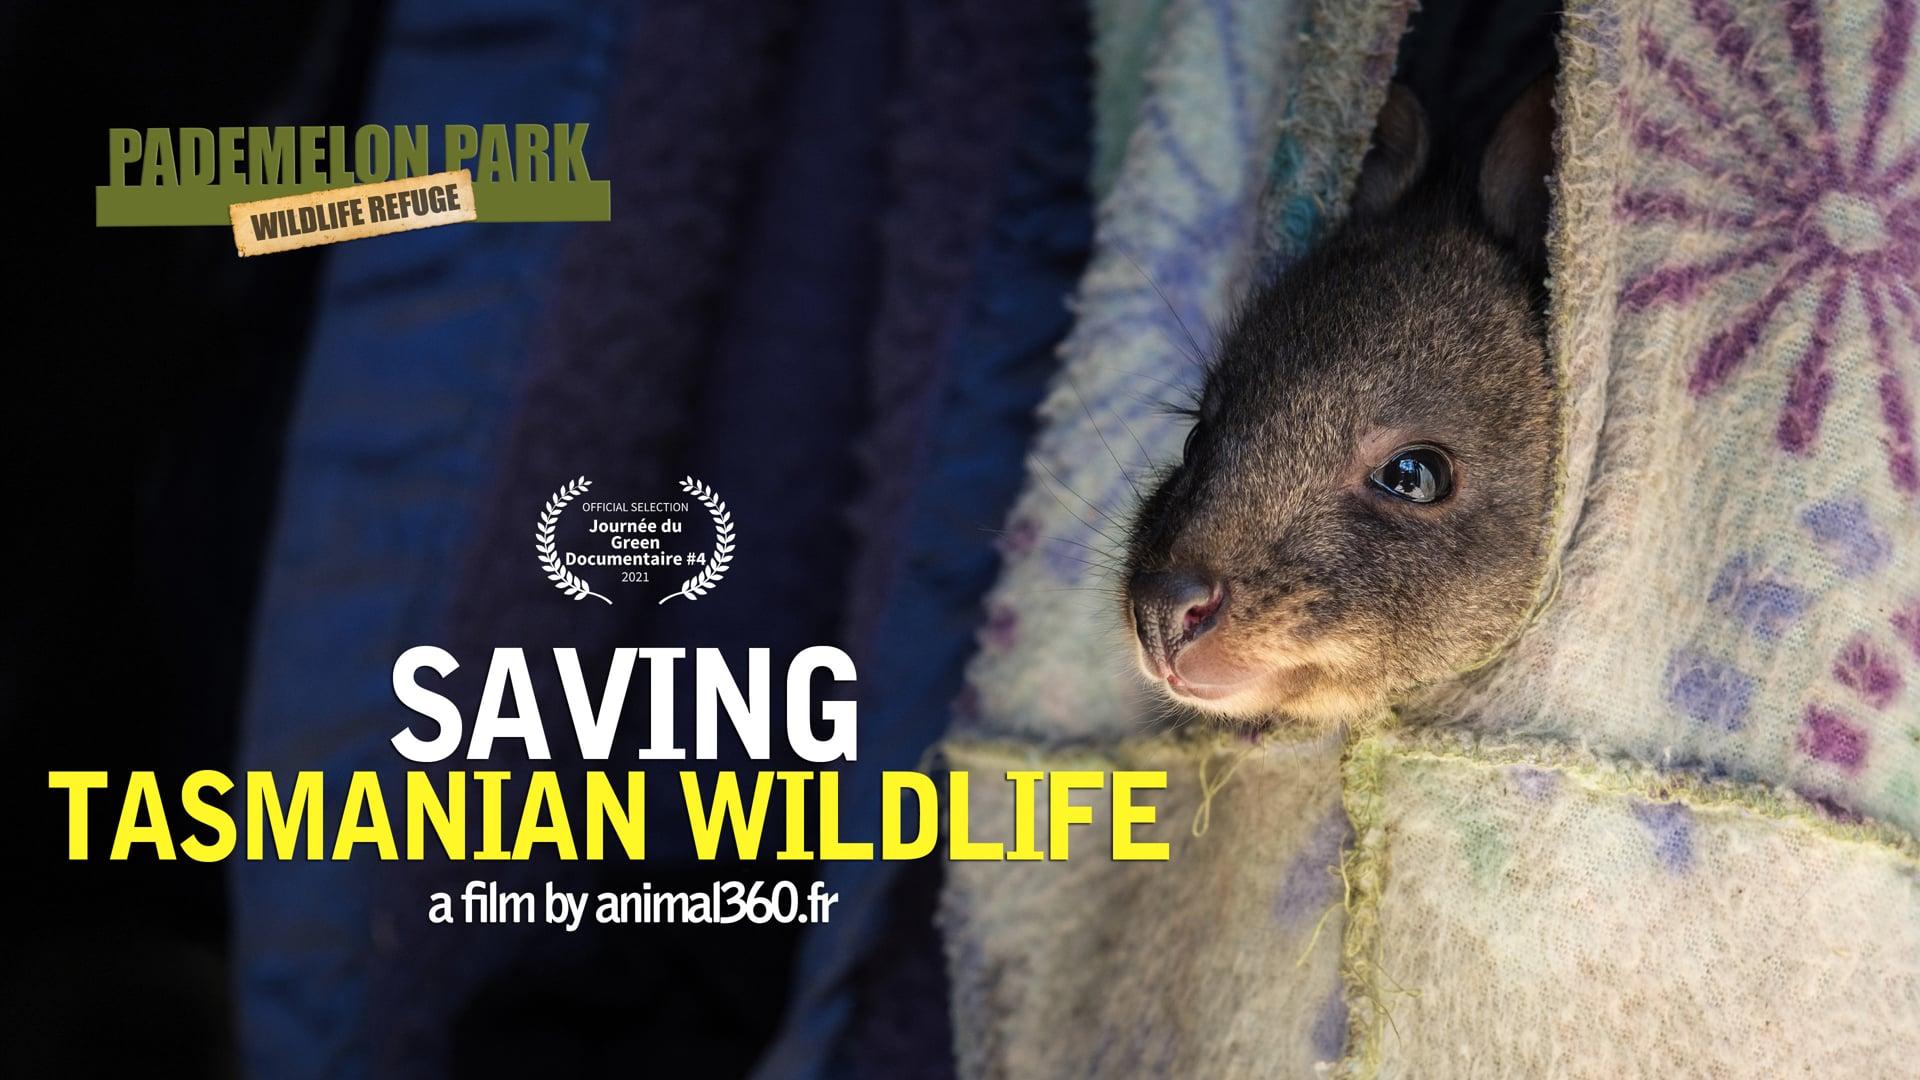 Pademelon Park wildlife refuge : Saving Tasmanian Wildlife